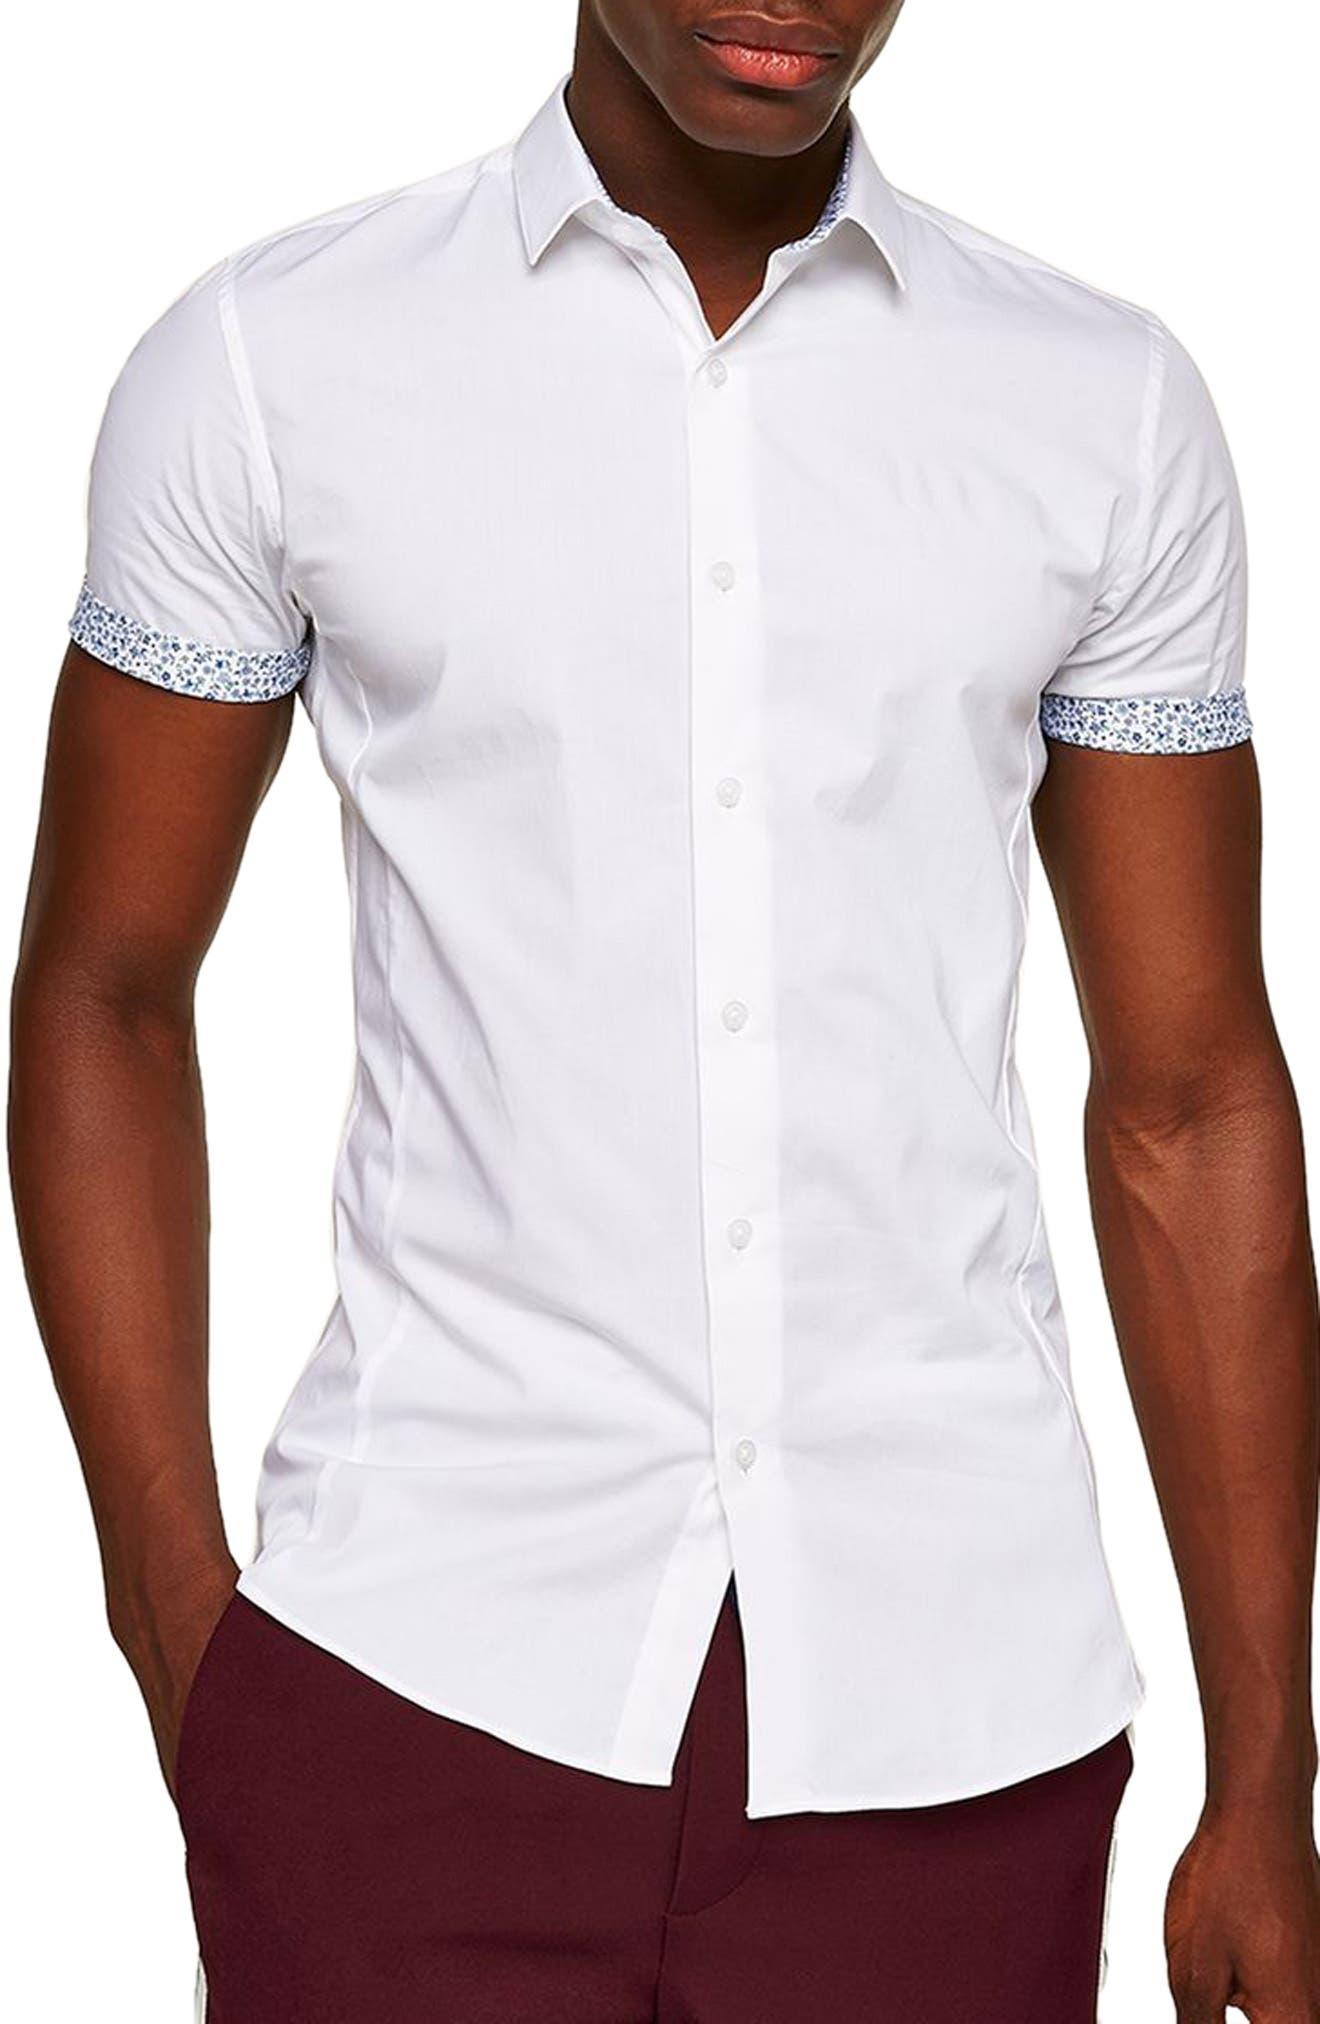 Muscle Fit Floral Trim Shirt,                             Main thumbnail 1, color,                             White Multi